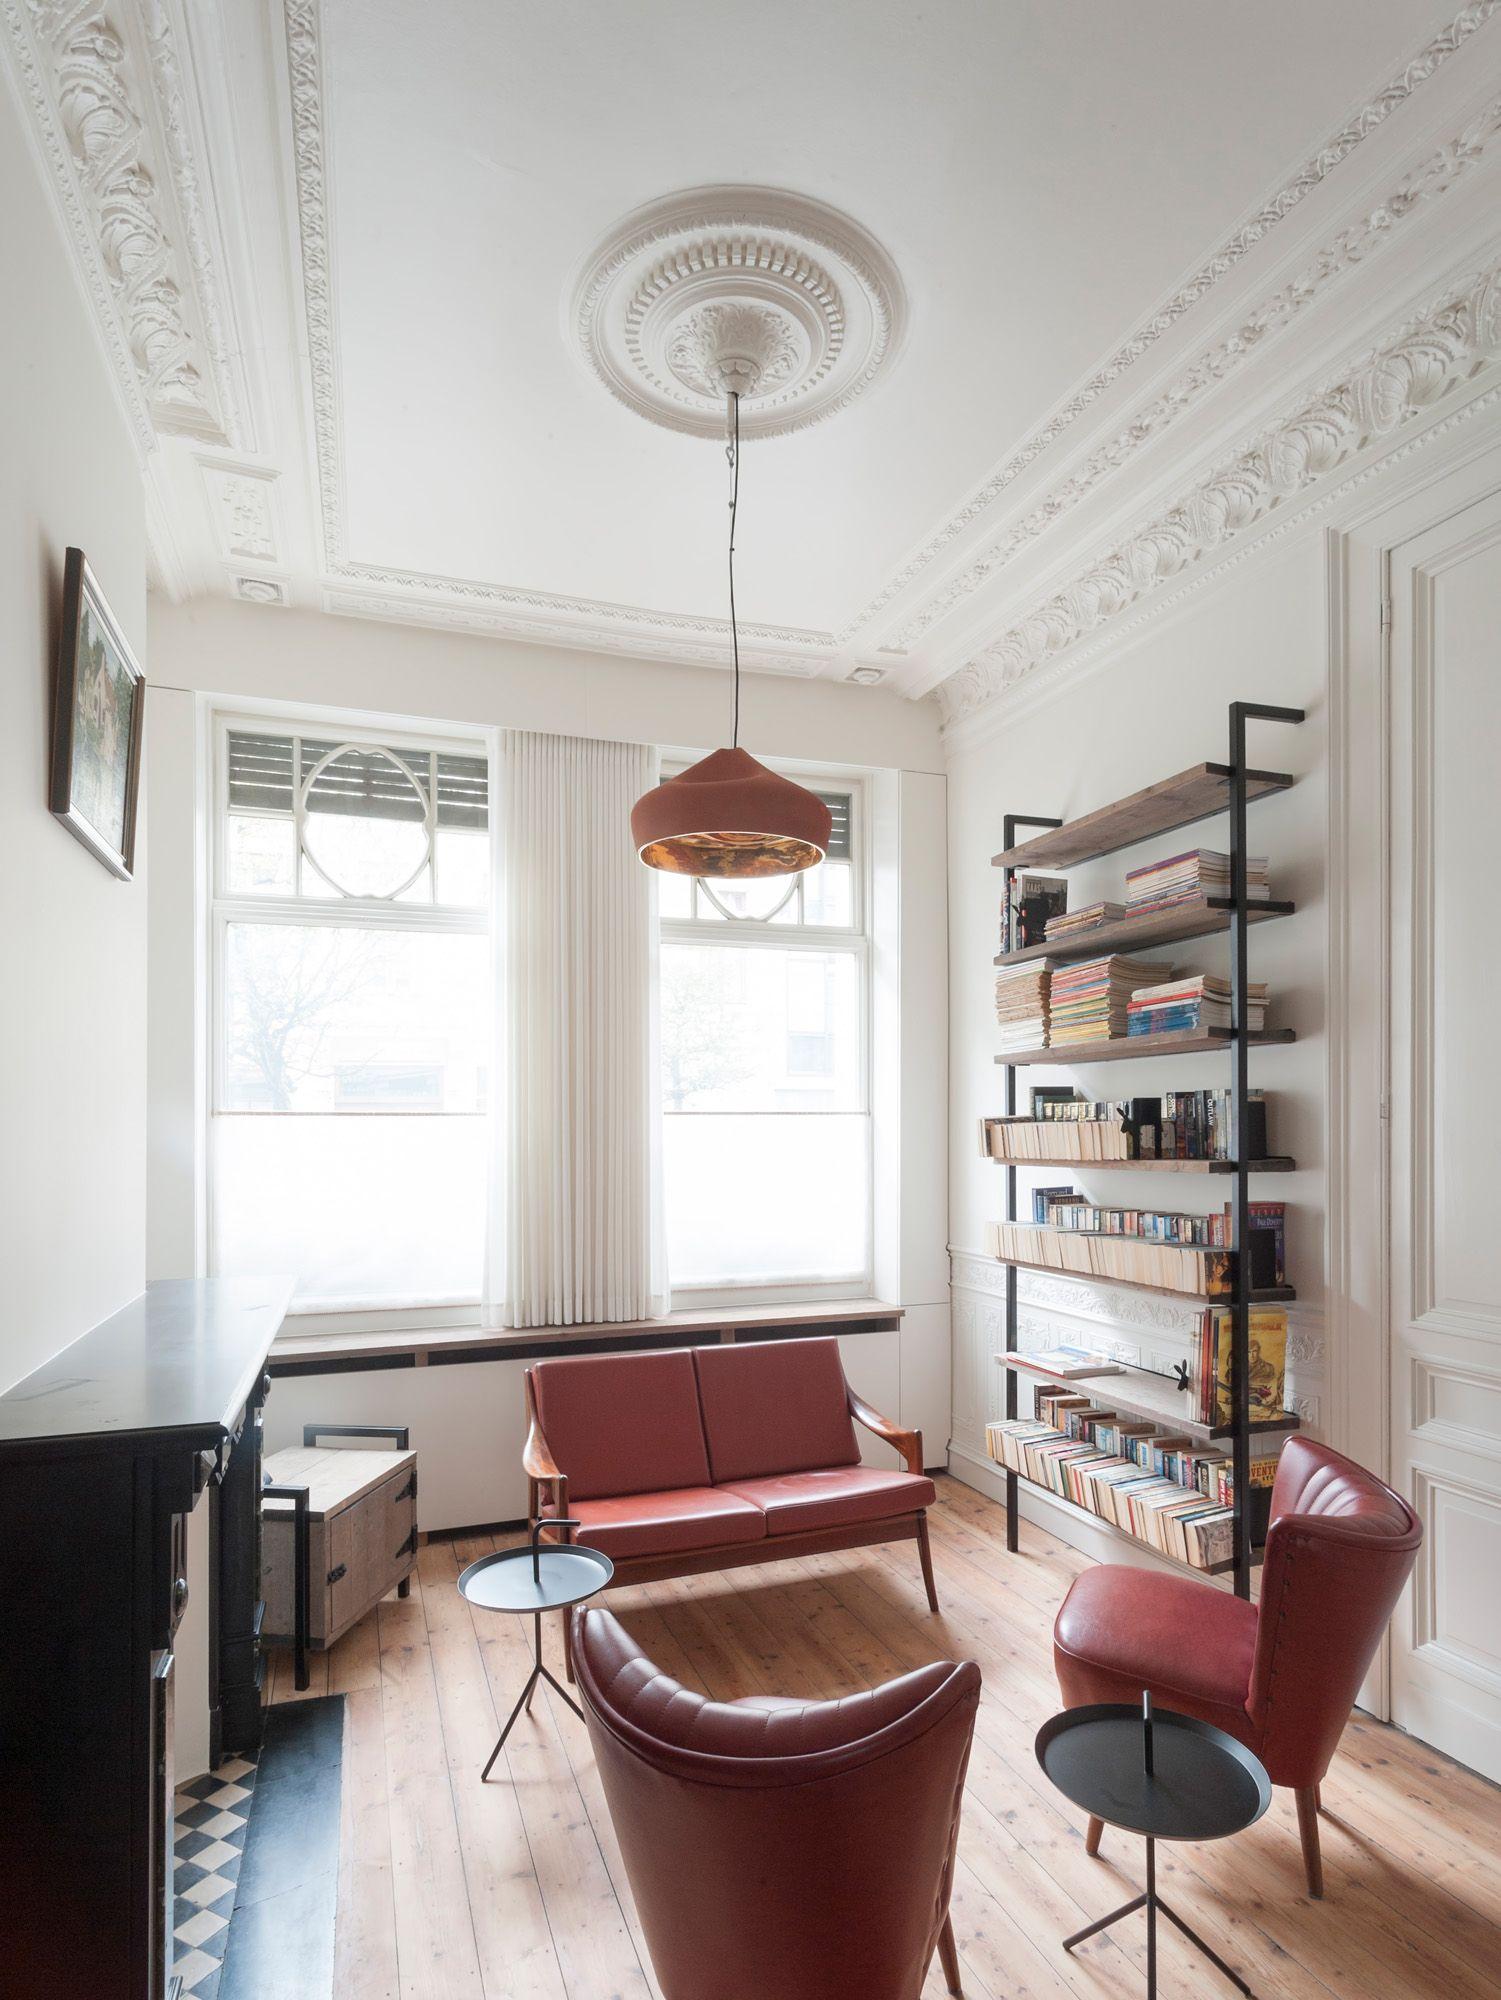 robby aerts » meubel interieur architectuur » renovatie woonkamer te ...